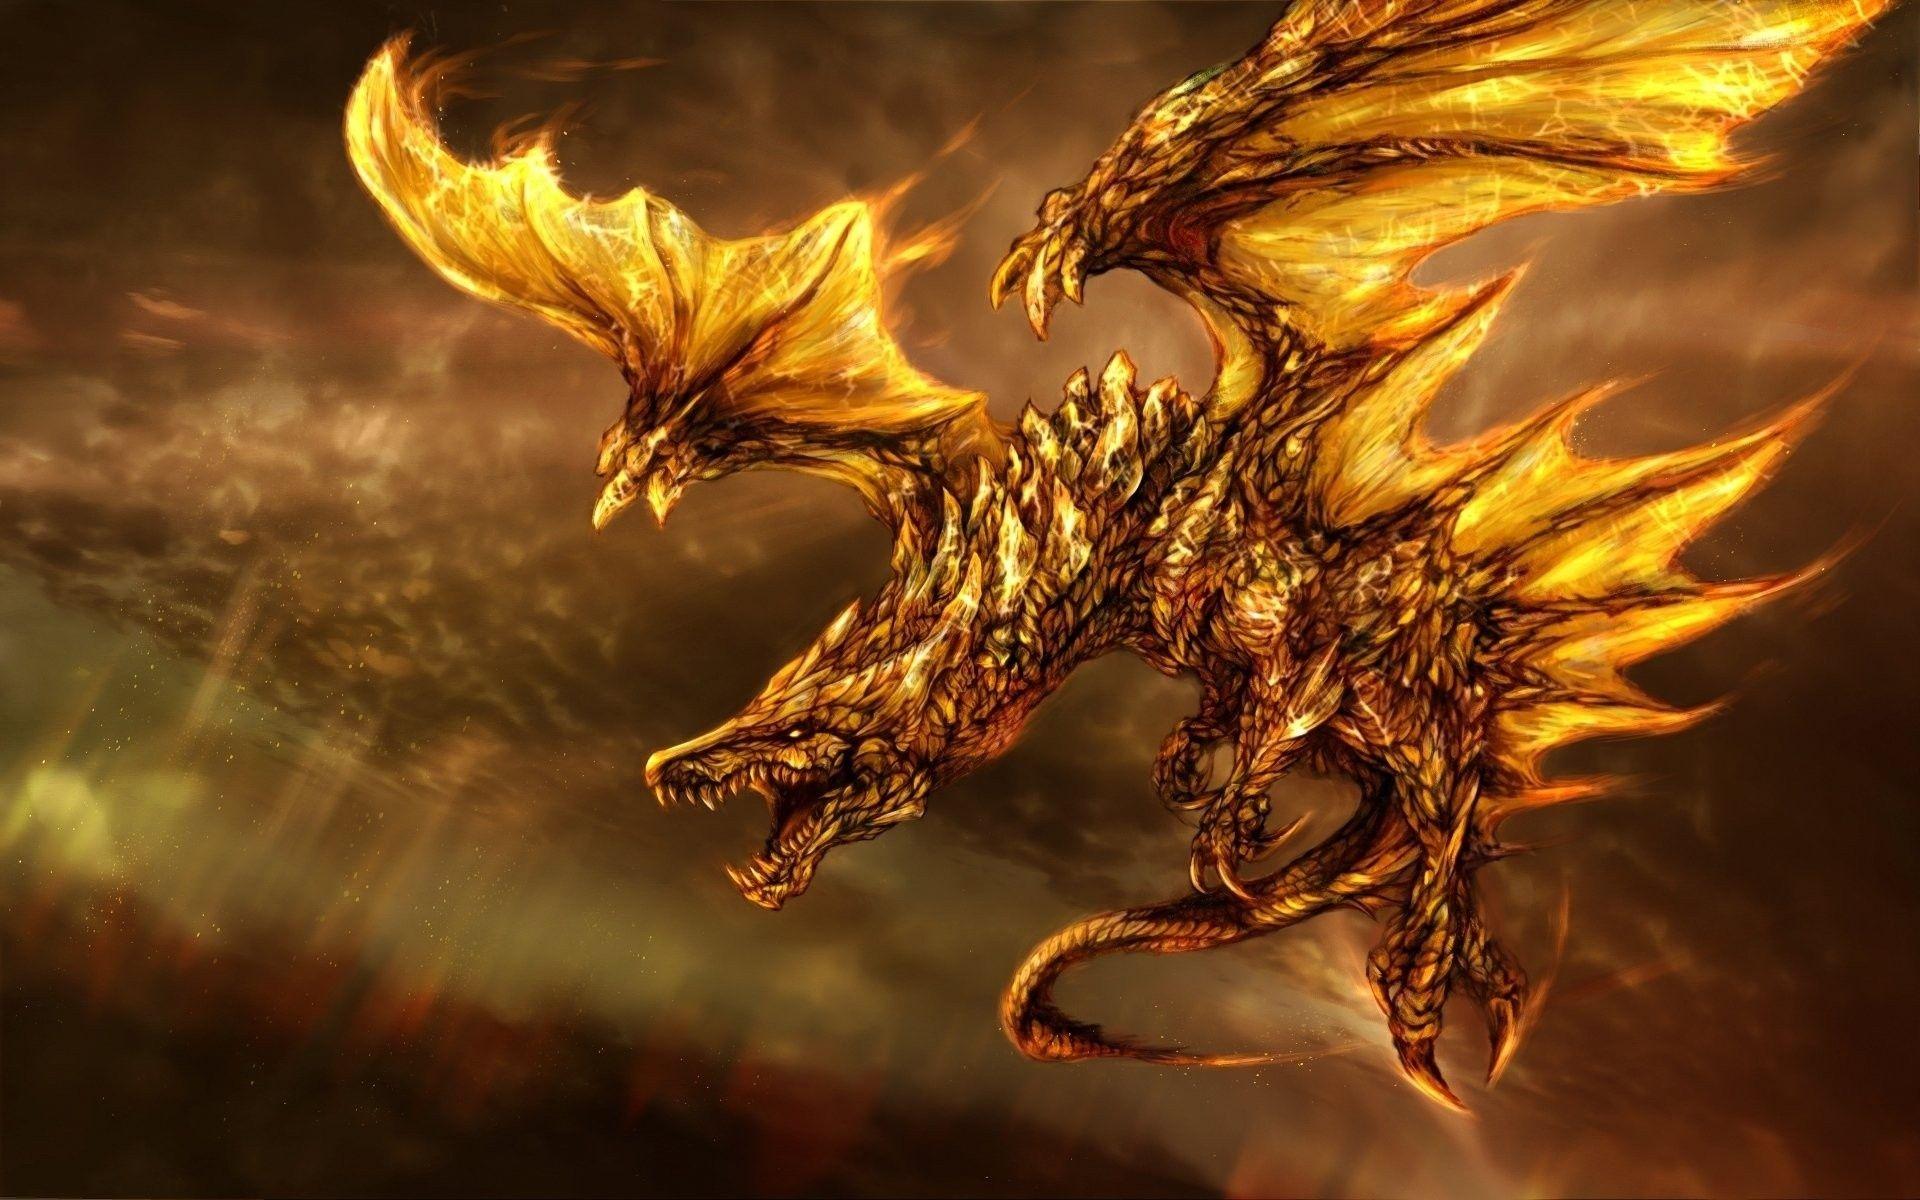 fire dragon art hd wallpaper #vo72b | dragons | pinterest | dragons